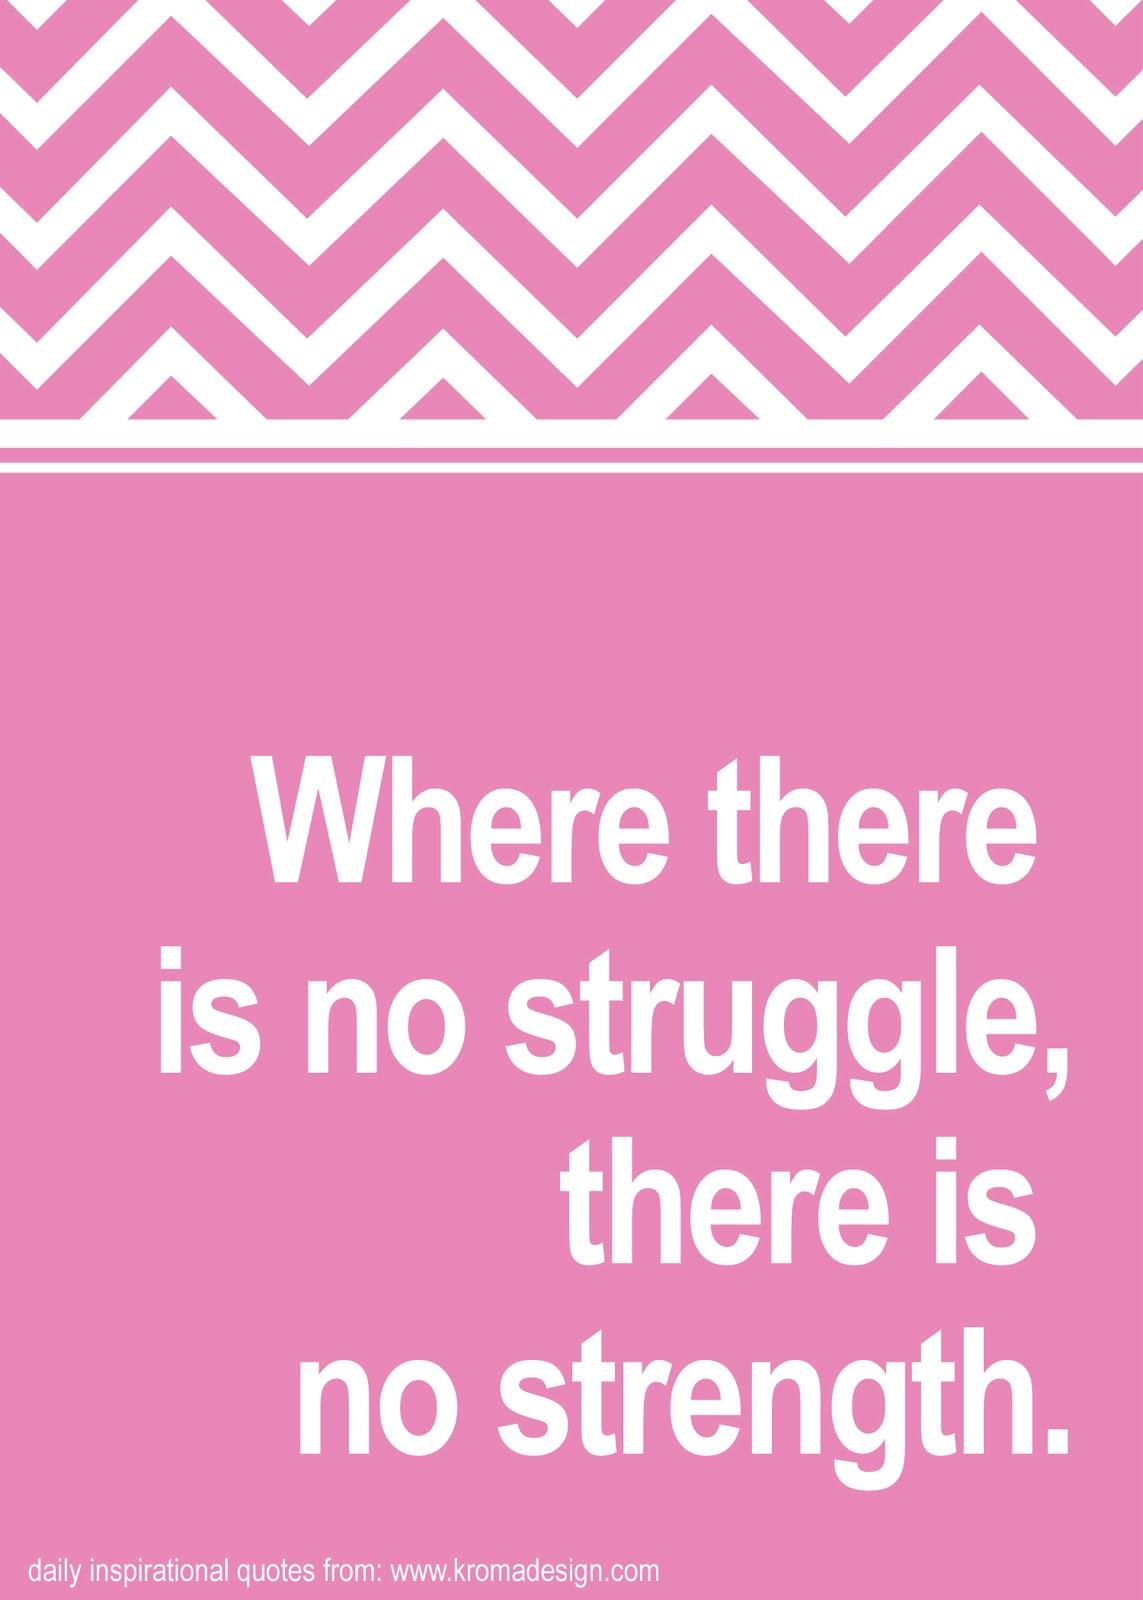 Prestigious quote #2